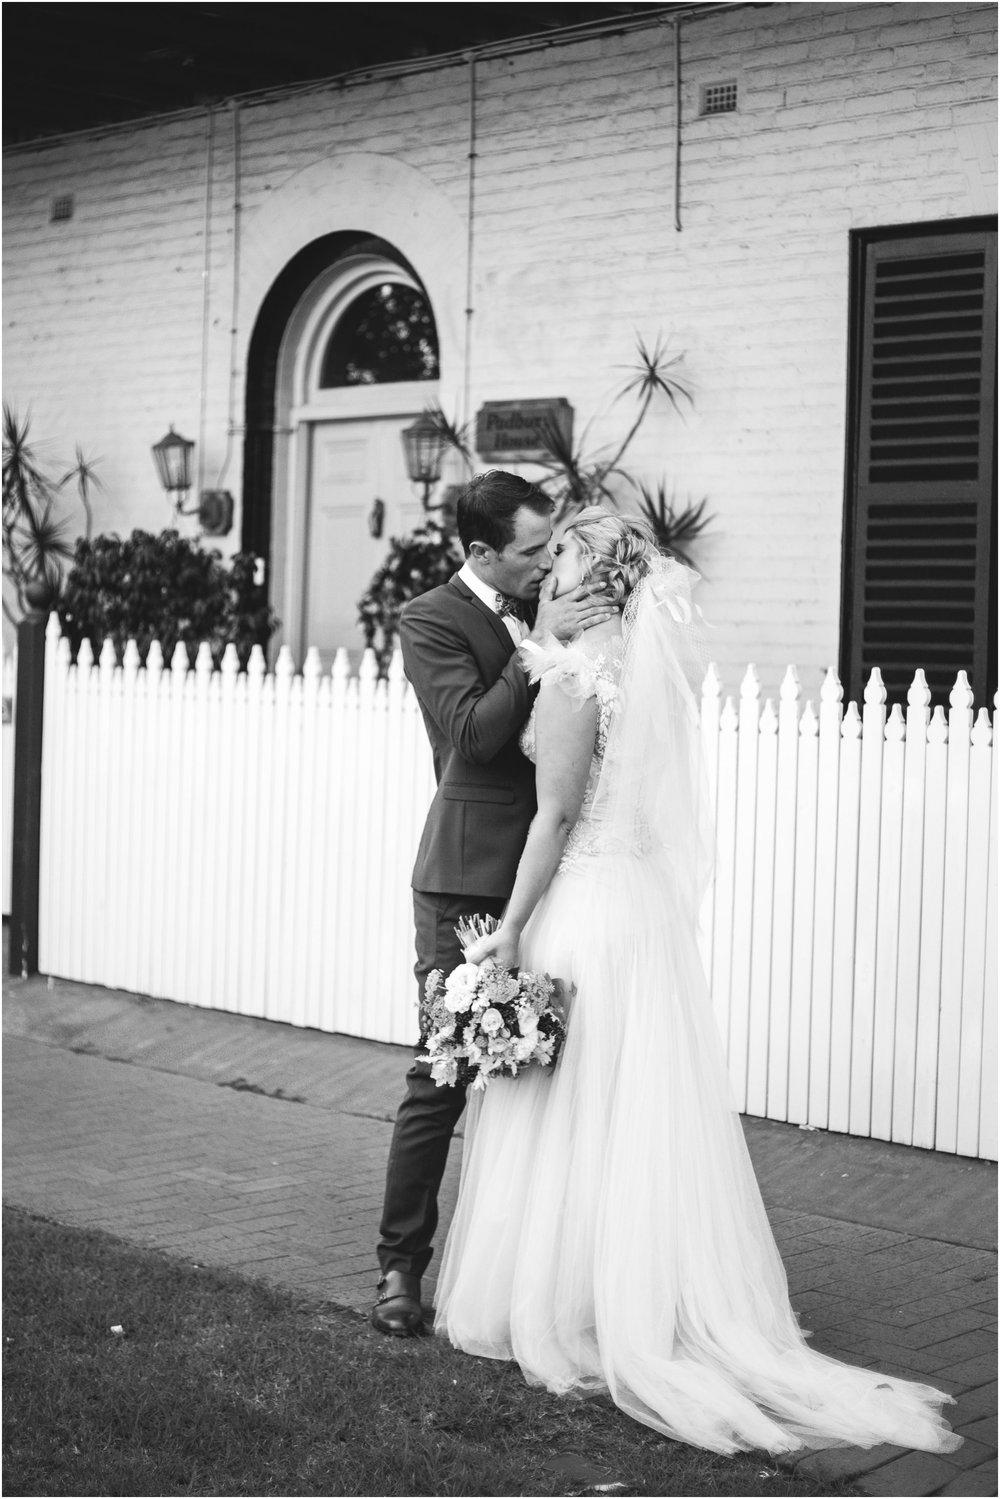 guildford-wedding-photos-liz-jorquera.jpg